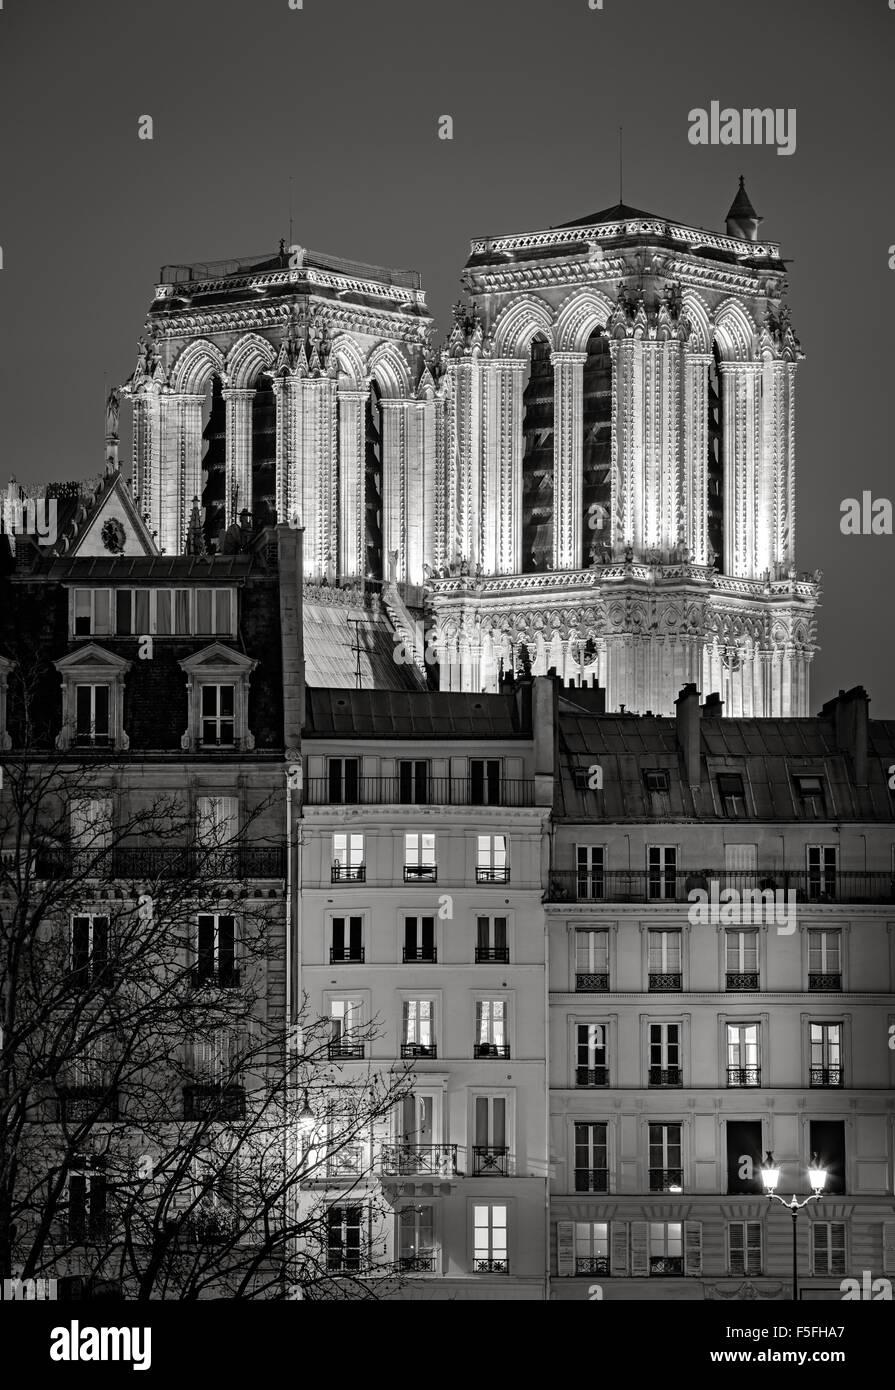 French Gothic towers of Notre Dame de Paris Cathedral illuminated at night. Ile de la Cite, 4th arrondissement, - Stock Image